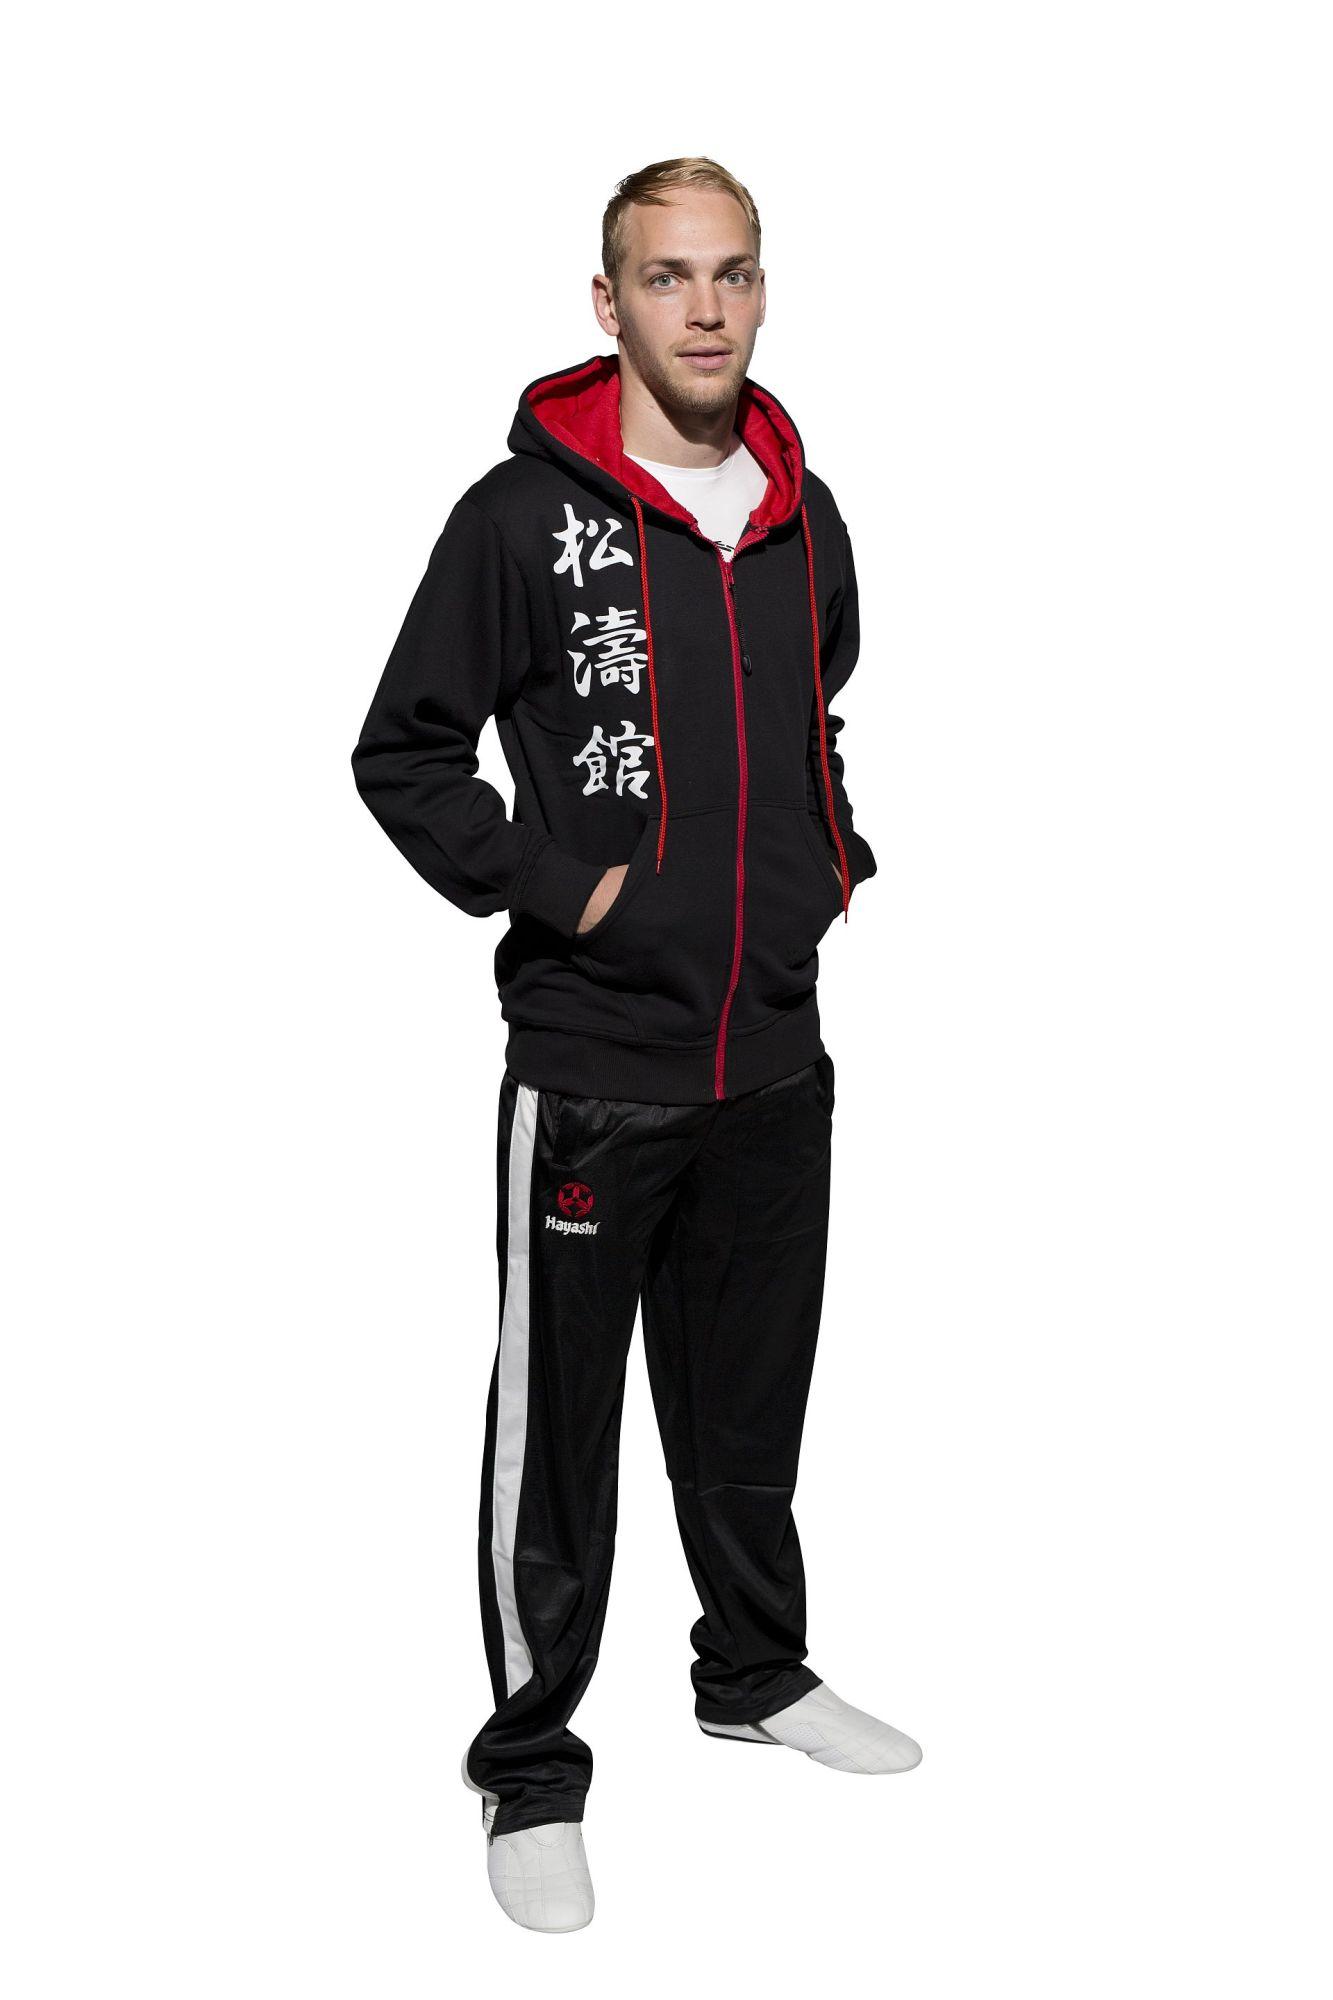 "Hayashi Trui met hoodie en rits ""Kanjin"" Zwart - rood"